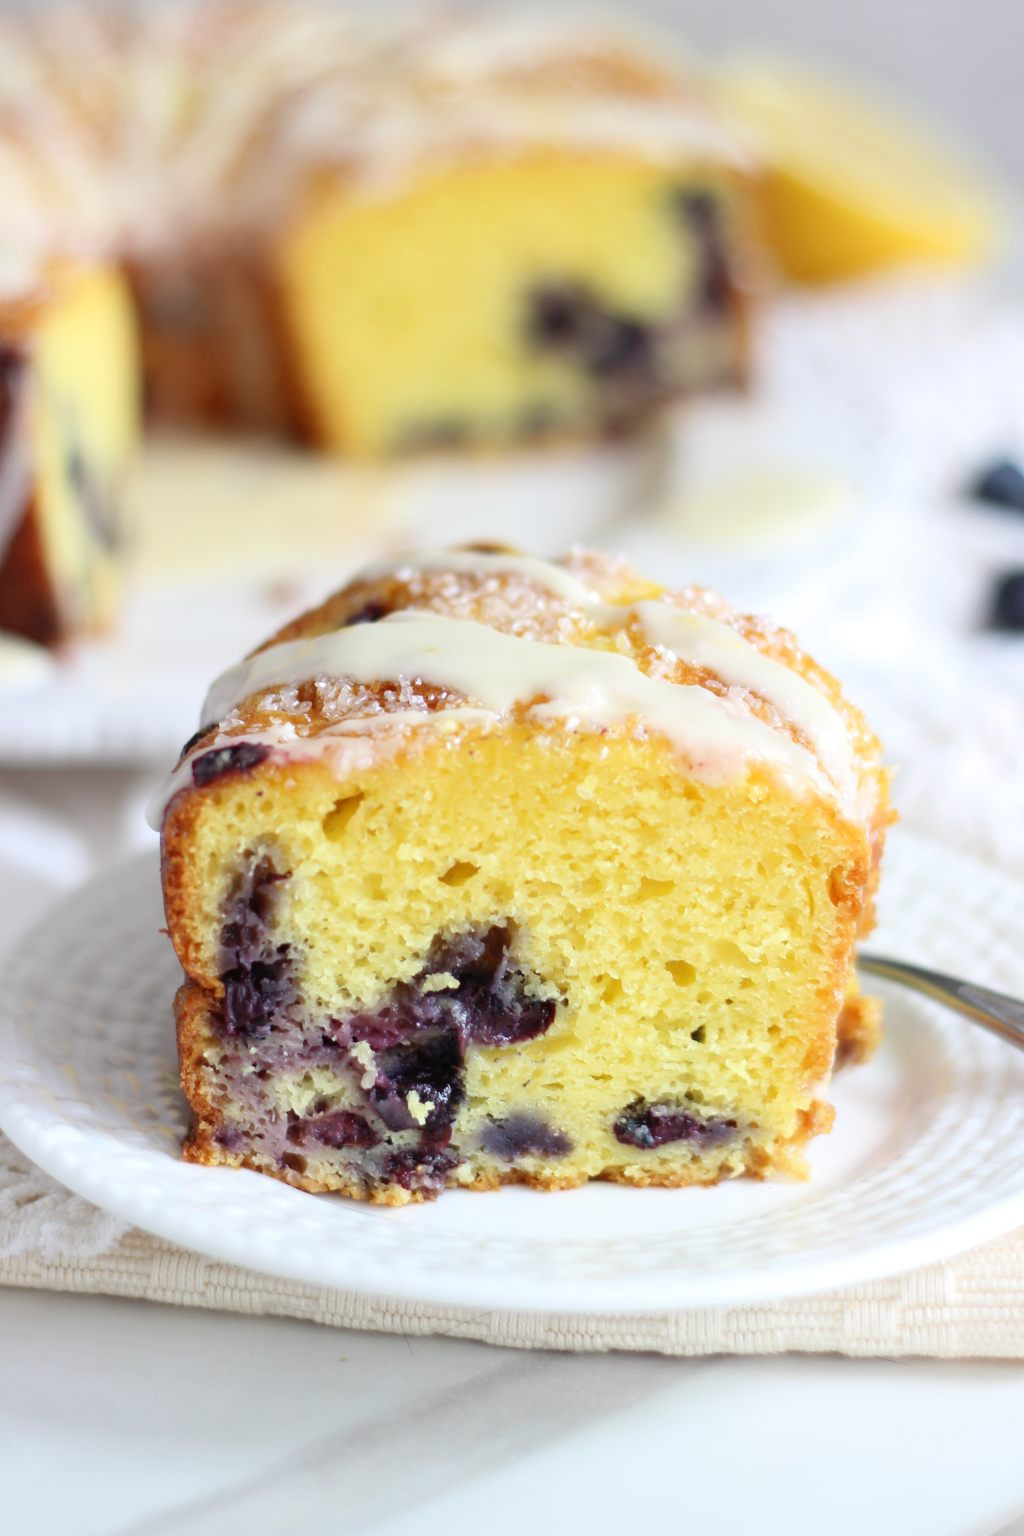 Lemon Bundt Cake From Cake Mix  Lemon Blueberry Bundt Cake with Lemon Glaze